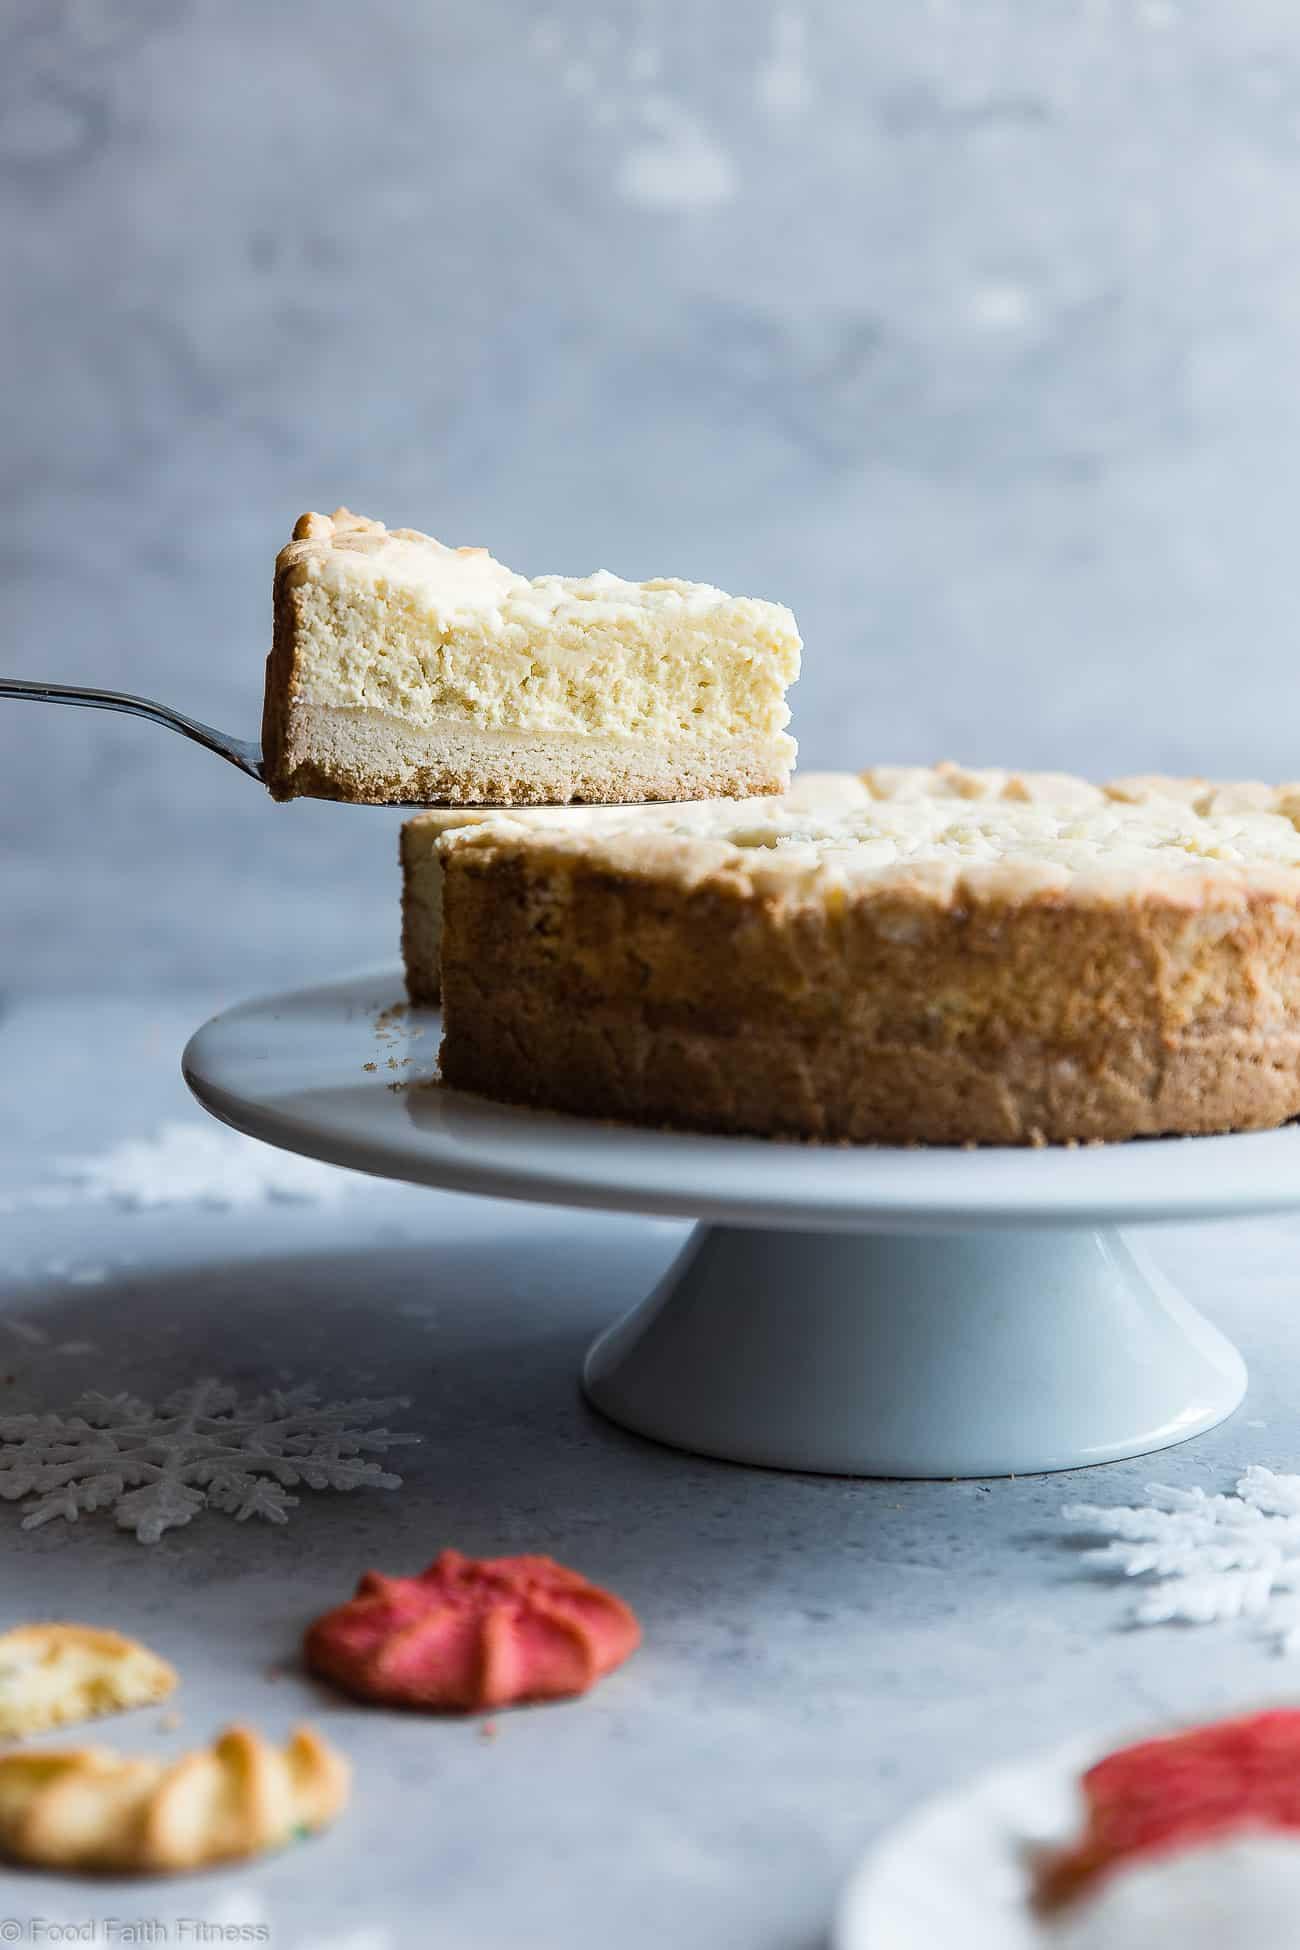 Sugar Cookie Greek Yogurt Gluten Free Cheesecake -This gluten free cheesecake is an easy dessert that combines 2 Holiday treats ! It's so creamy you won't believe it's healthy, sugar free and only 235 calories! | Foodfaithfitness.com | @FoodFaithFit